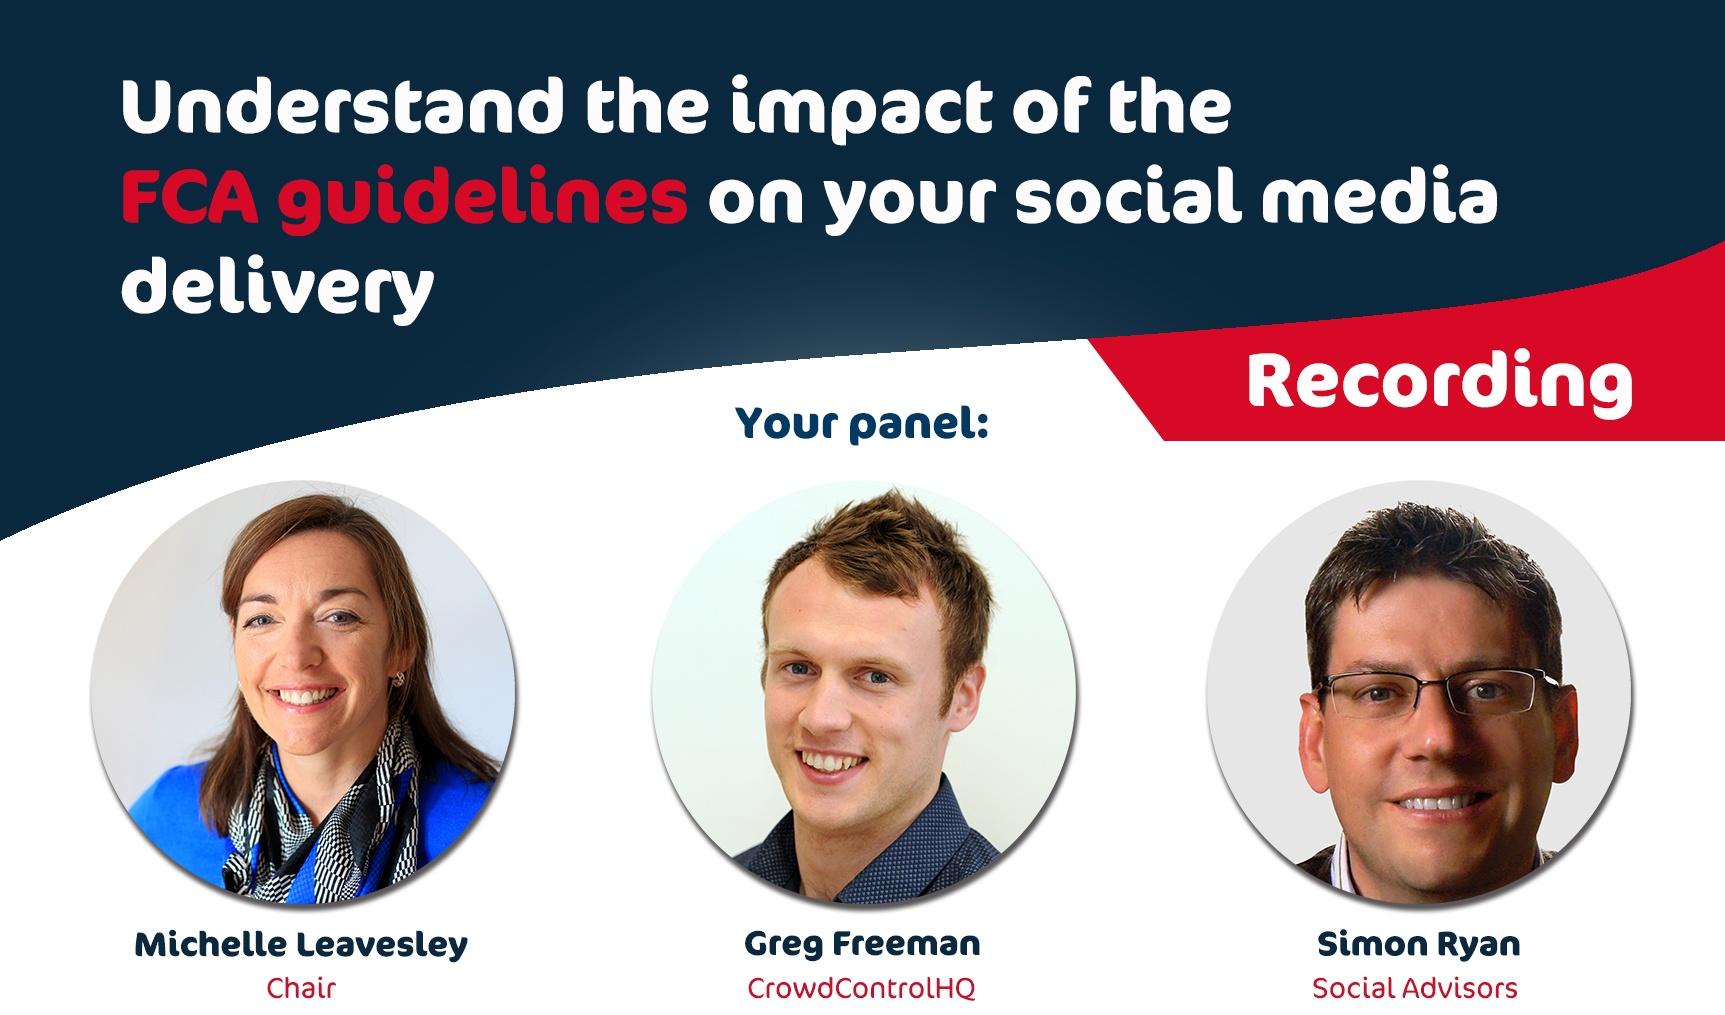 Webinar focused on the FCA social media guidance